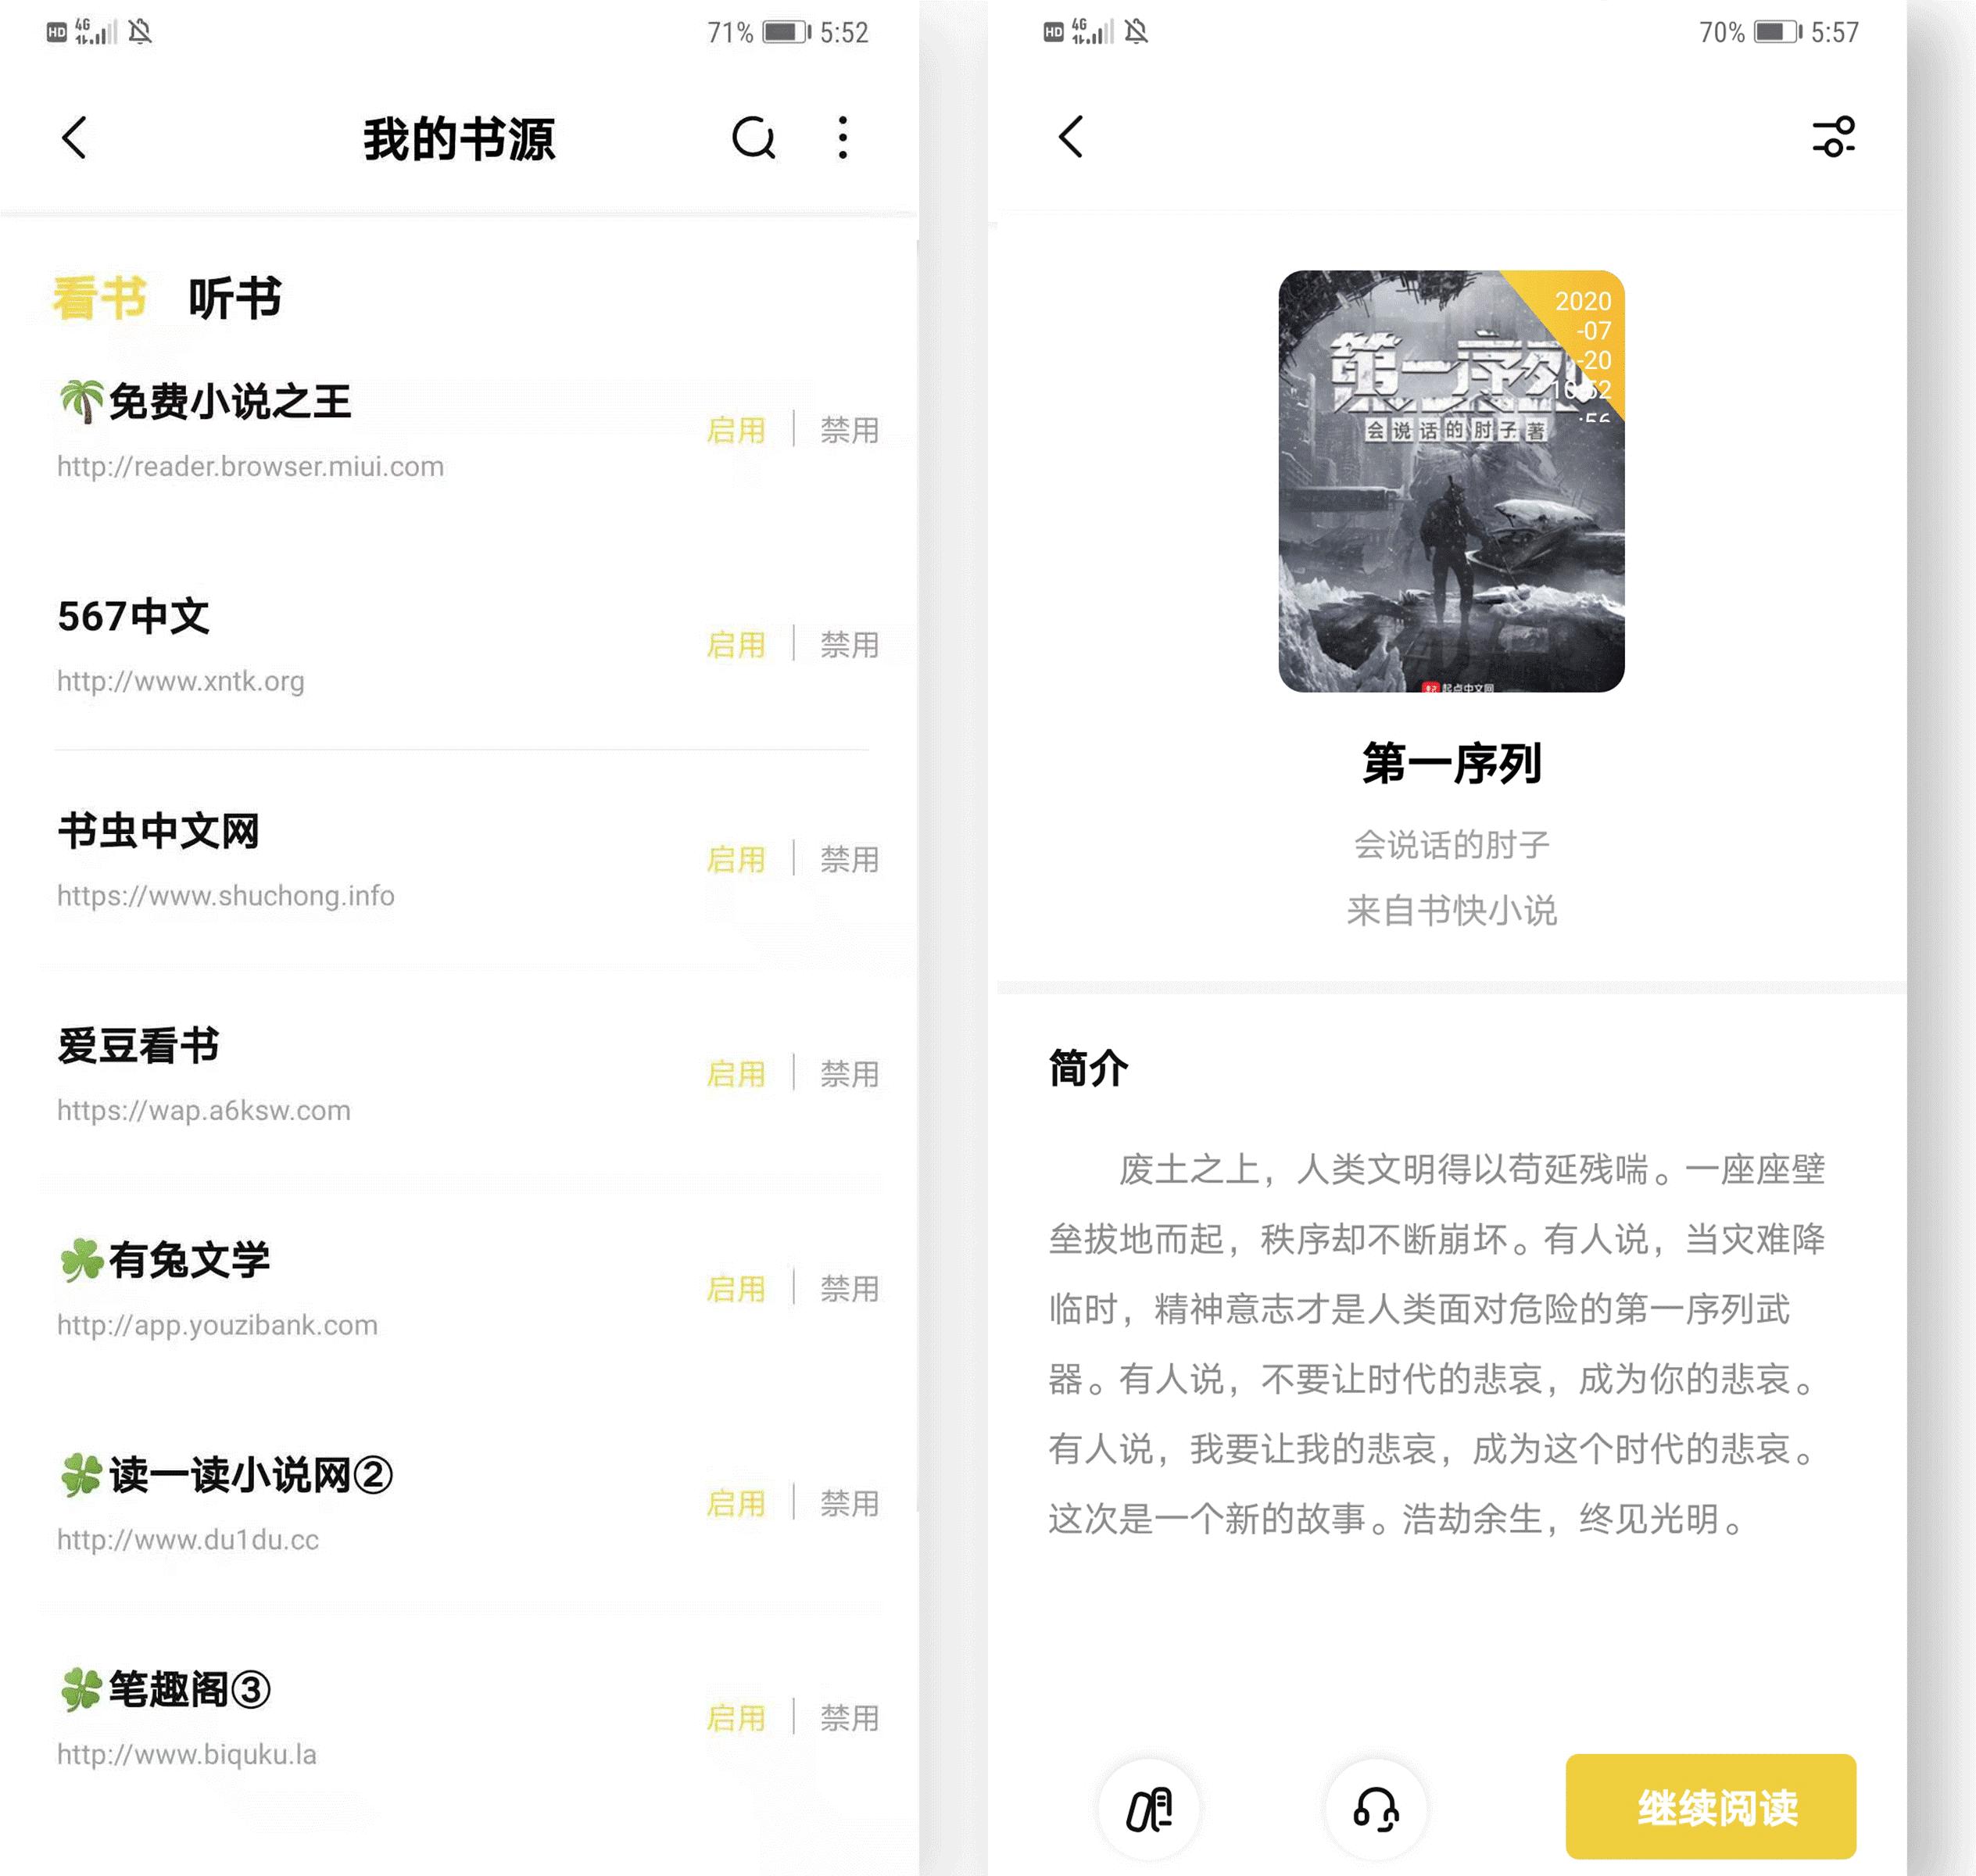 推荐:Android 启阅(看小说神器) v2.2.7 无广告破解版